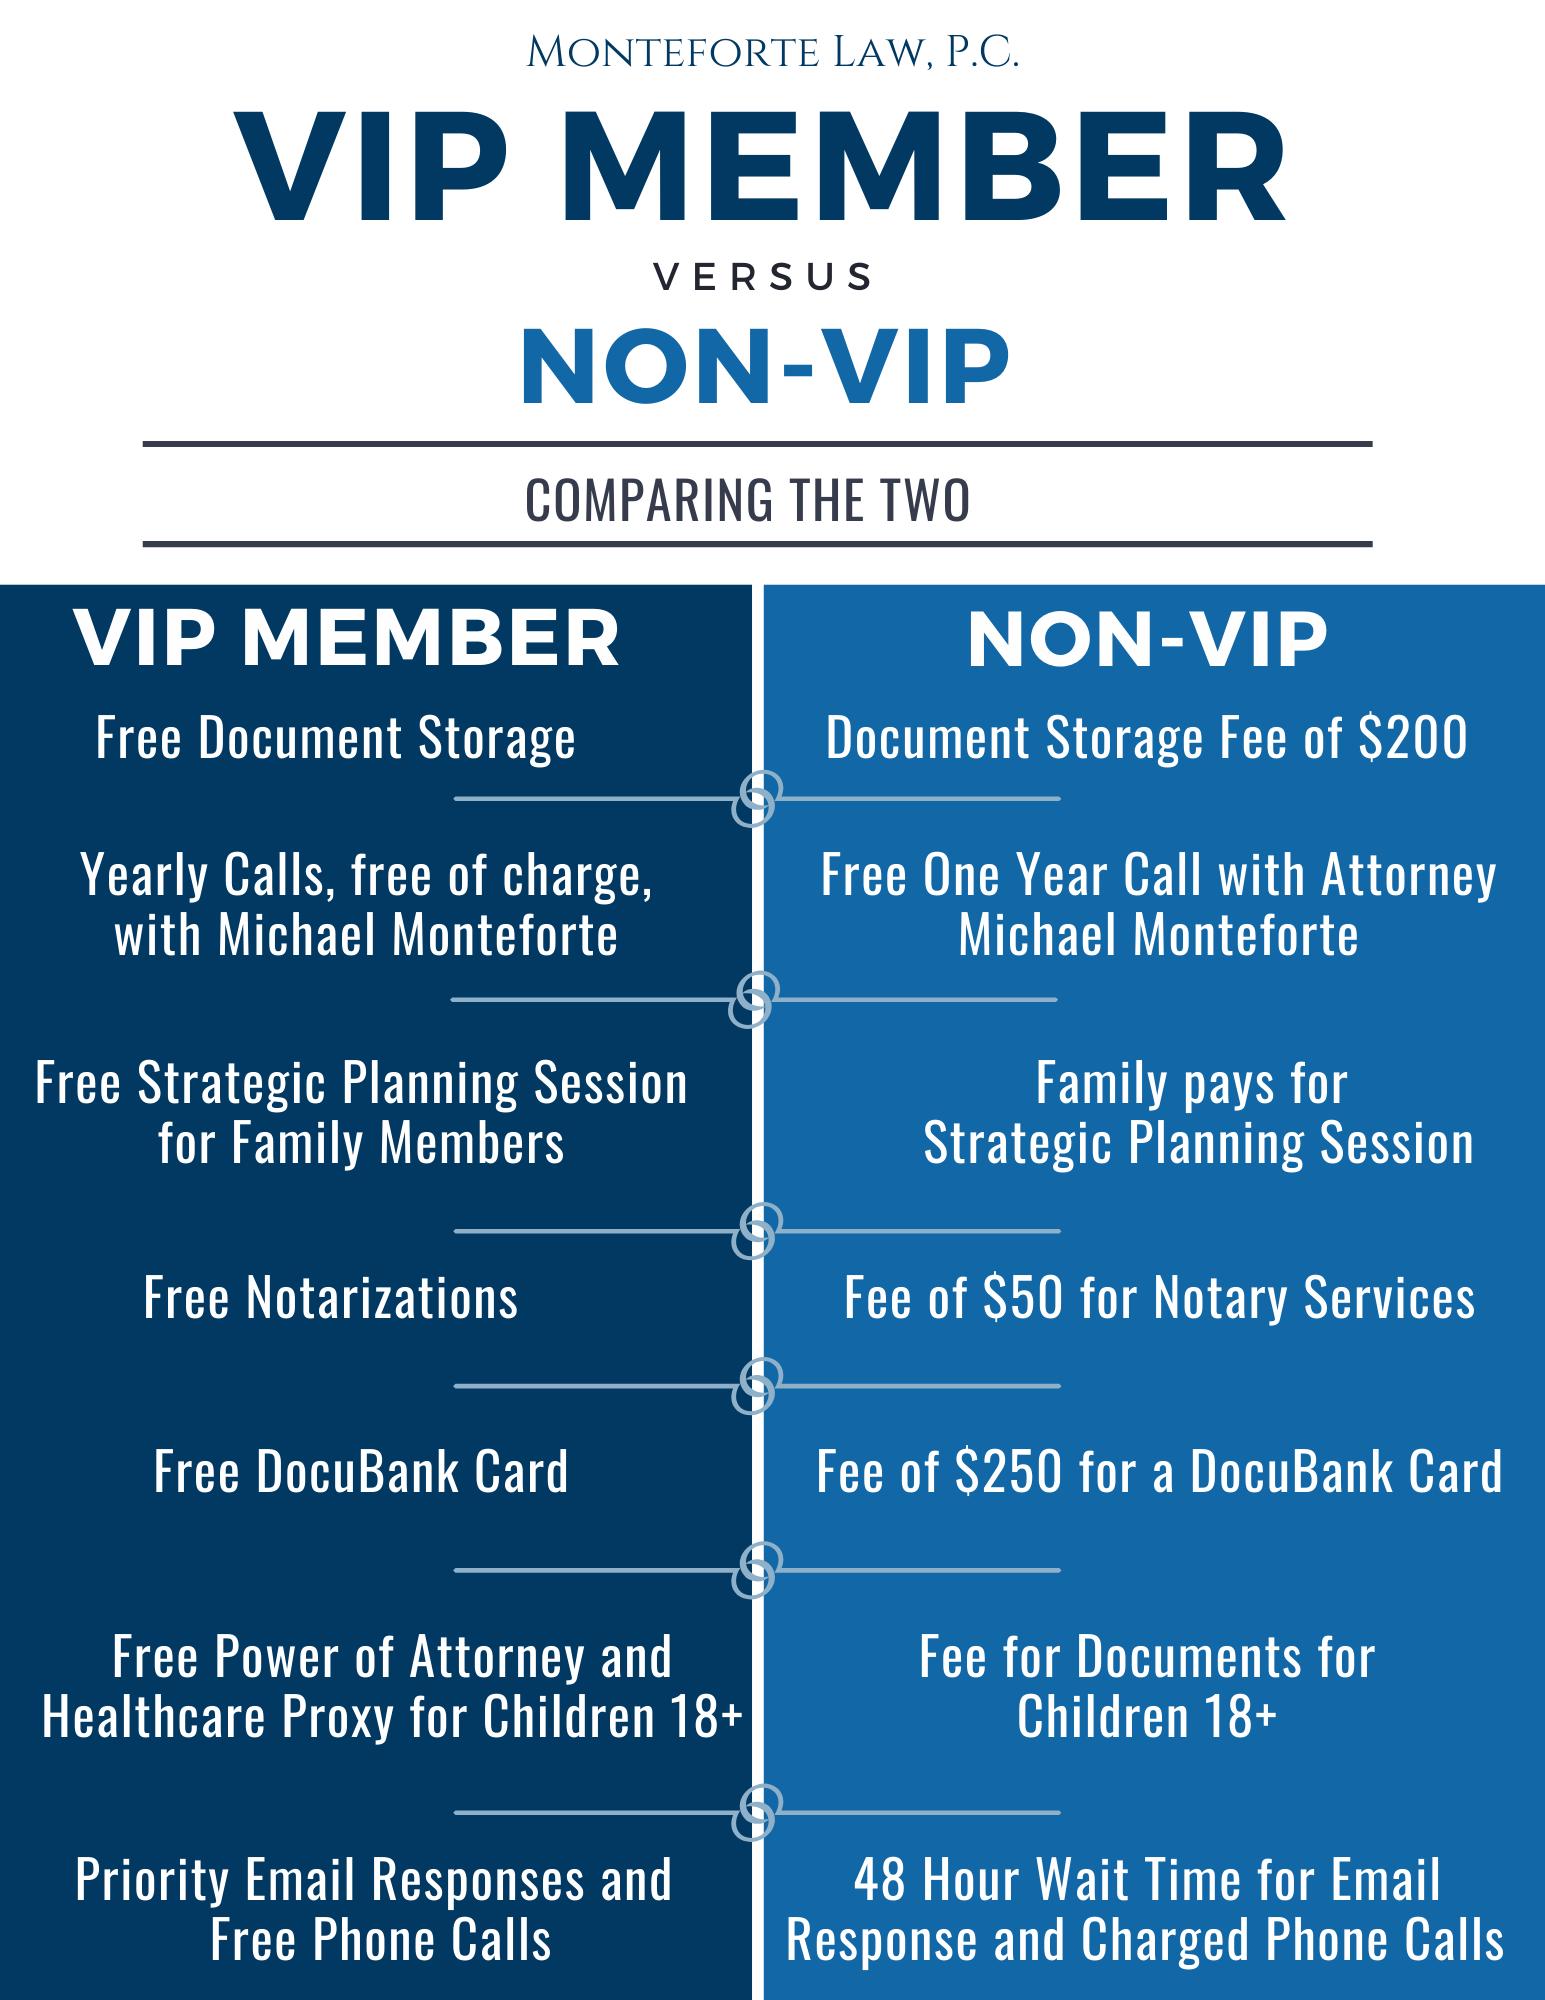 VIP Program Monteforte Law